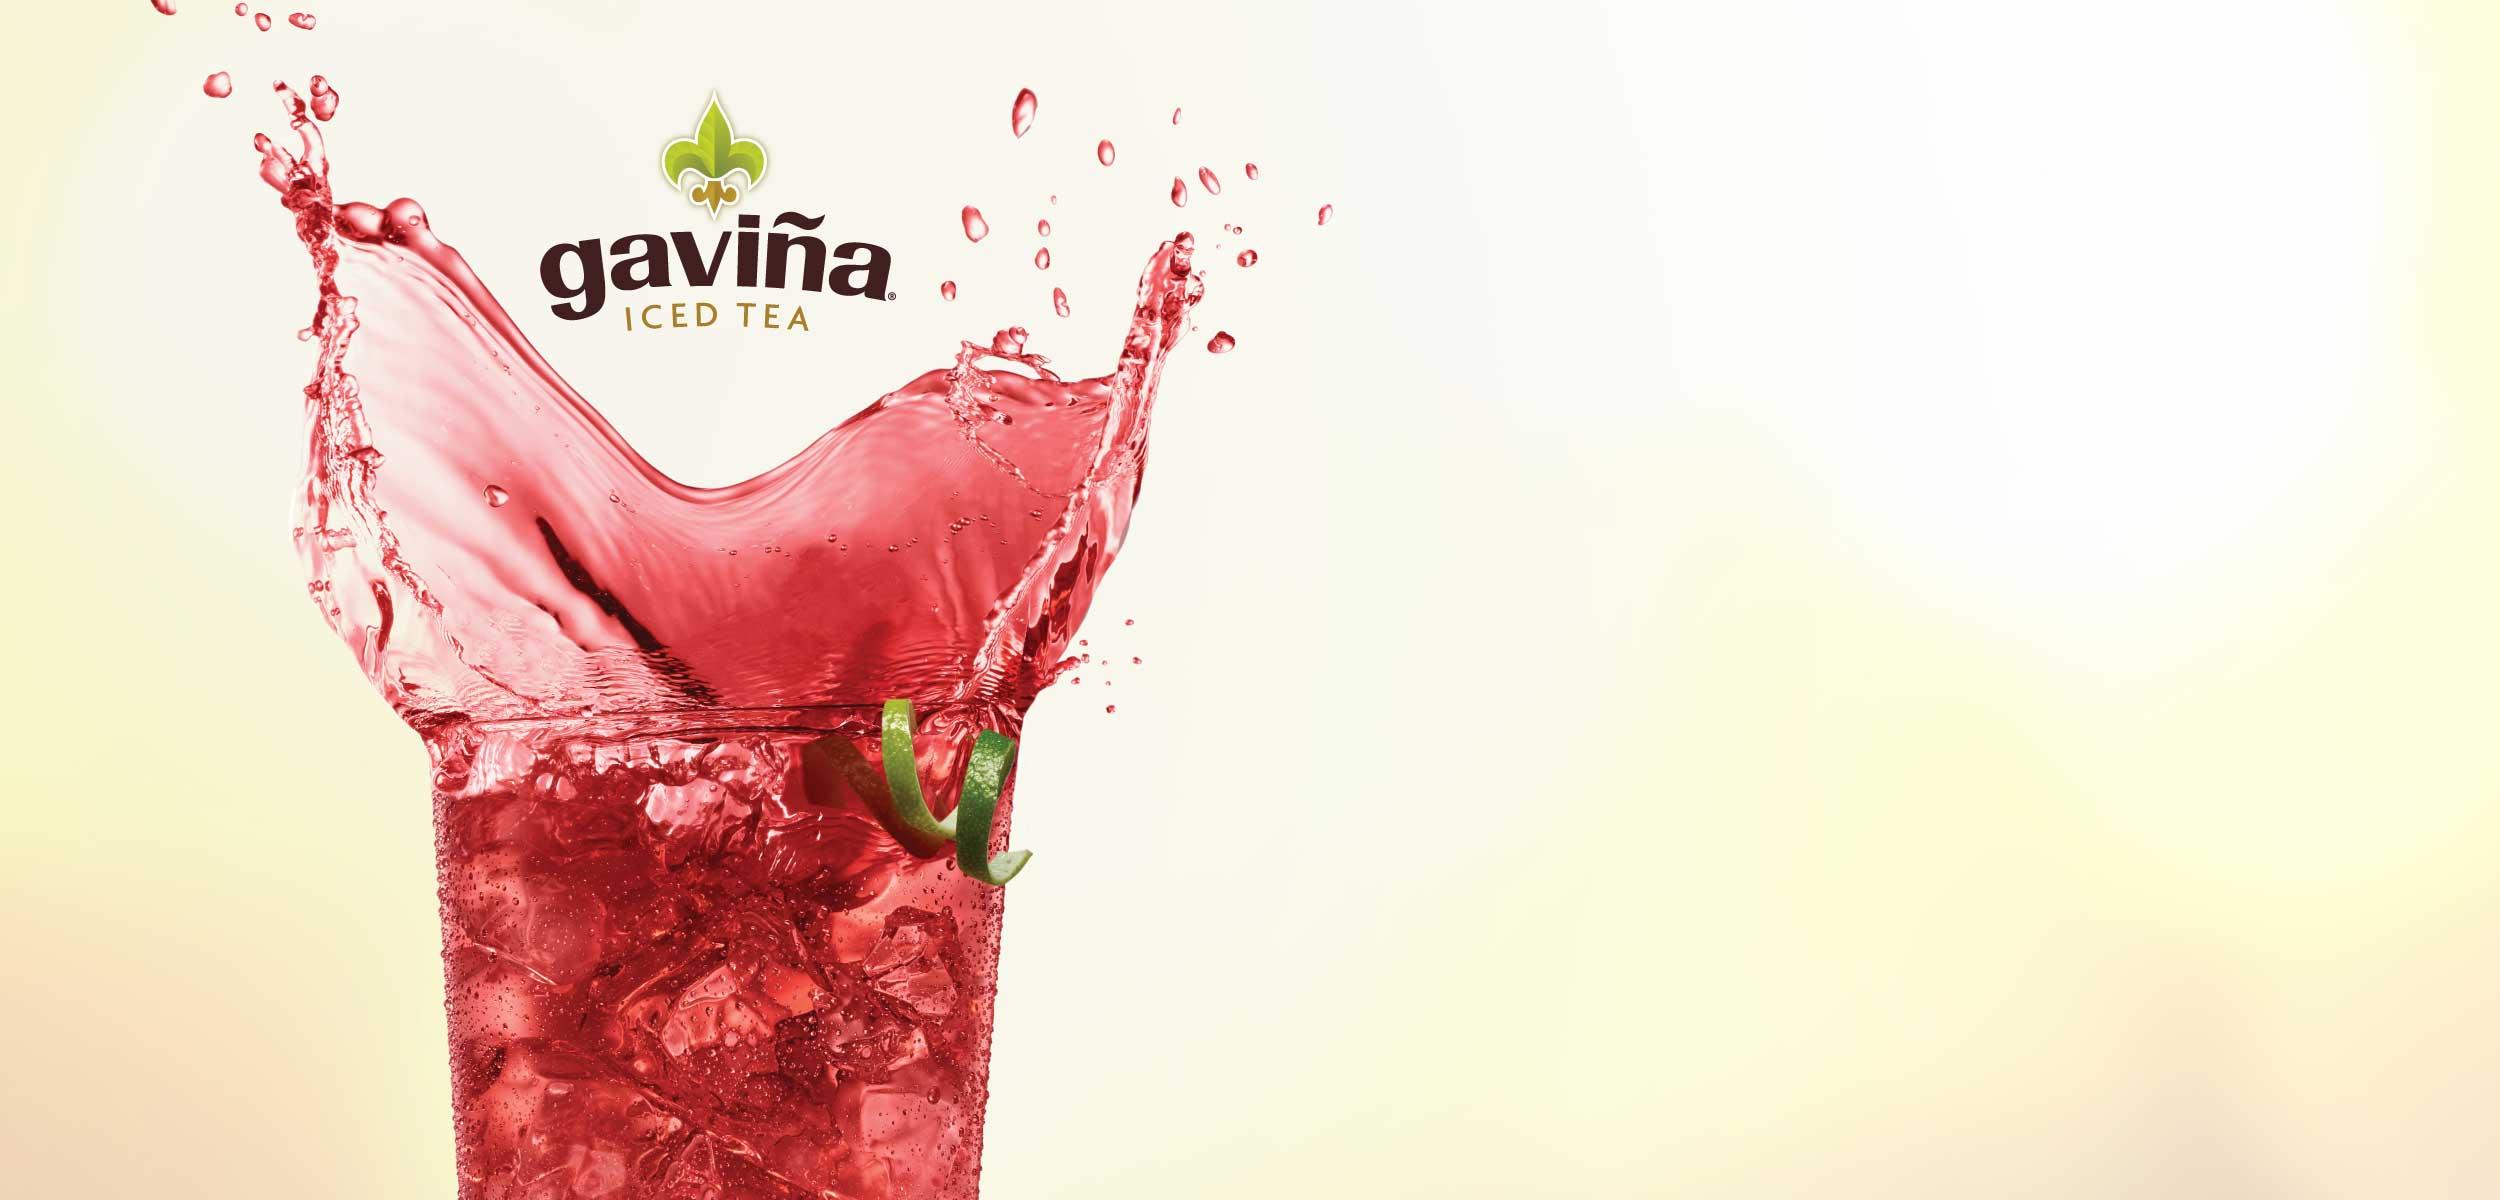 Gavina iced tea